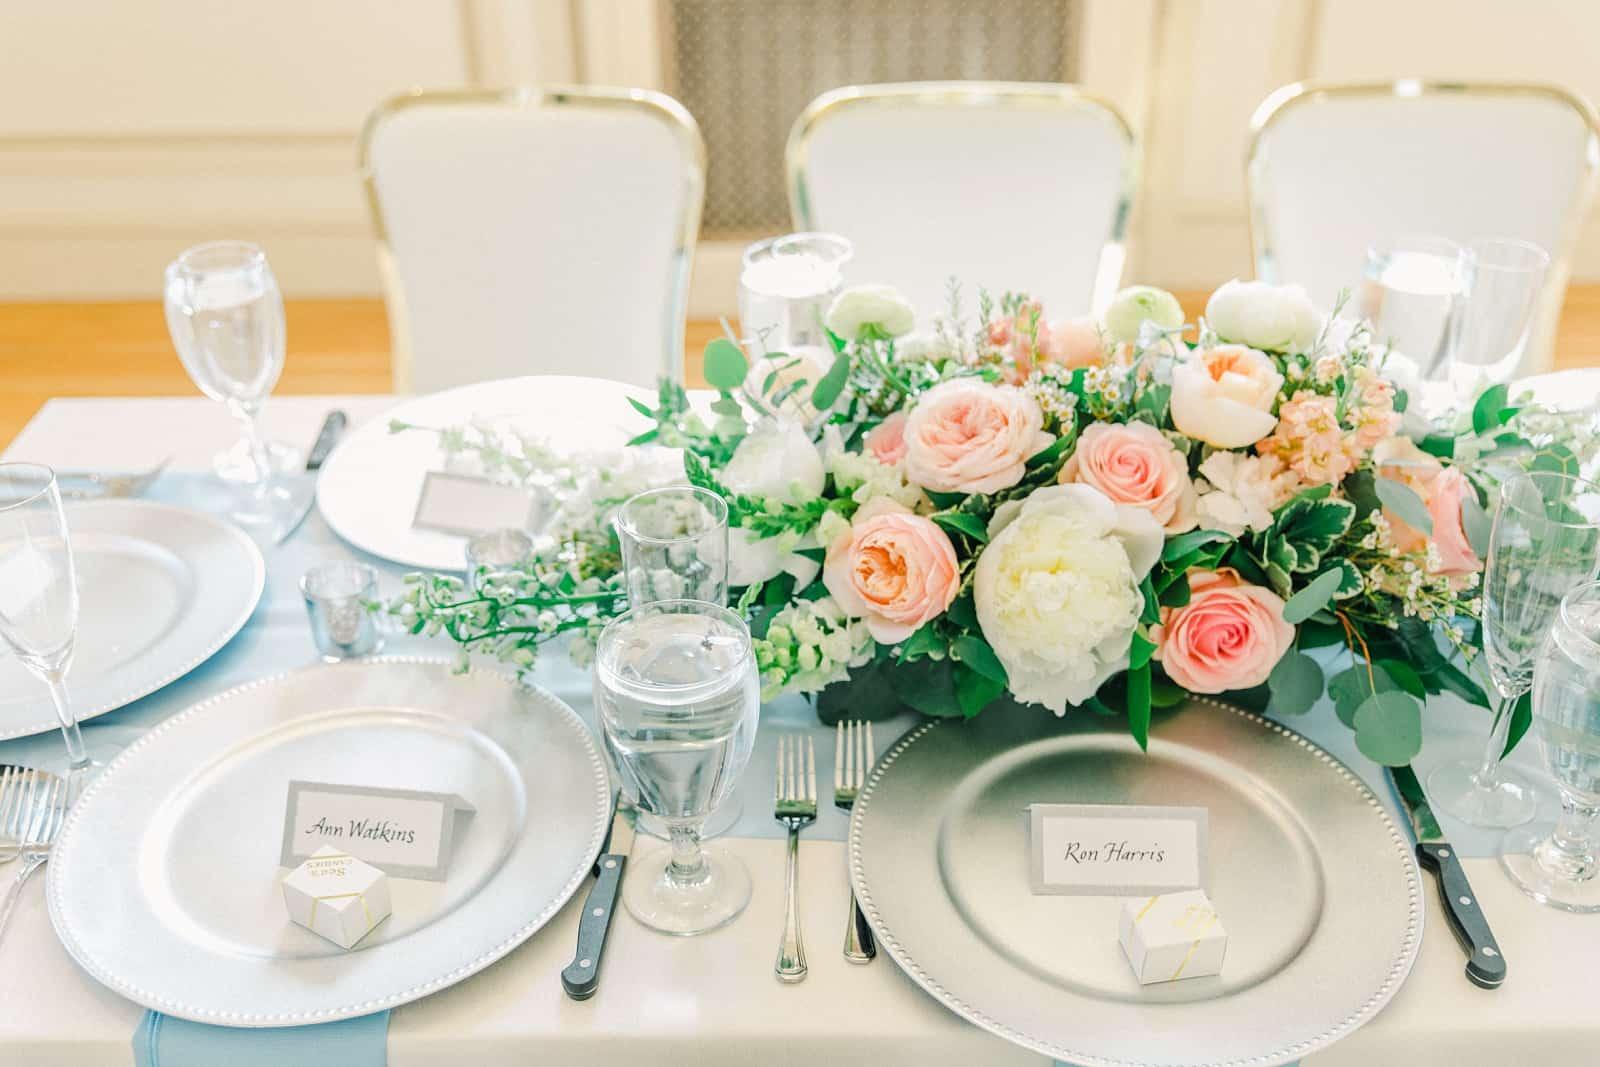 Thomas S. Monson Center Wedding, Salt Lake LDS Temple Wedding, Utah wedding photography, reception decor tablescape centerpiece